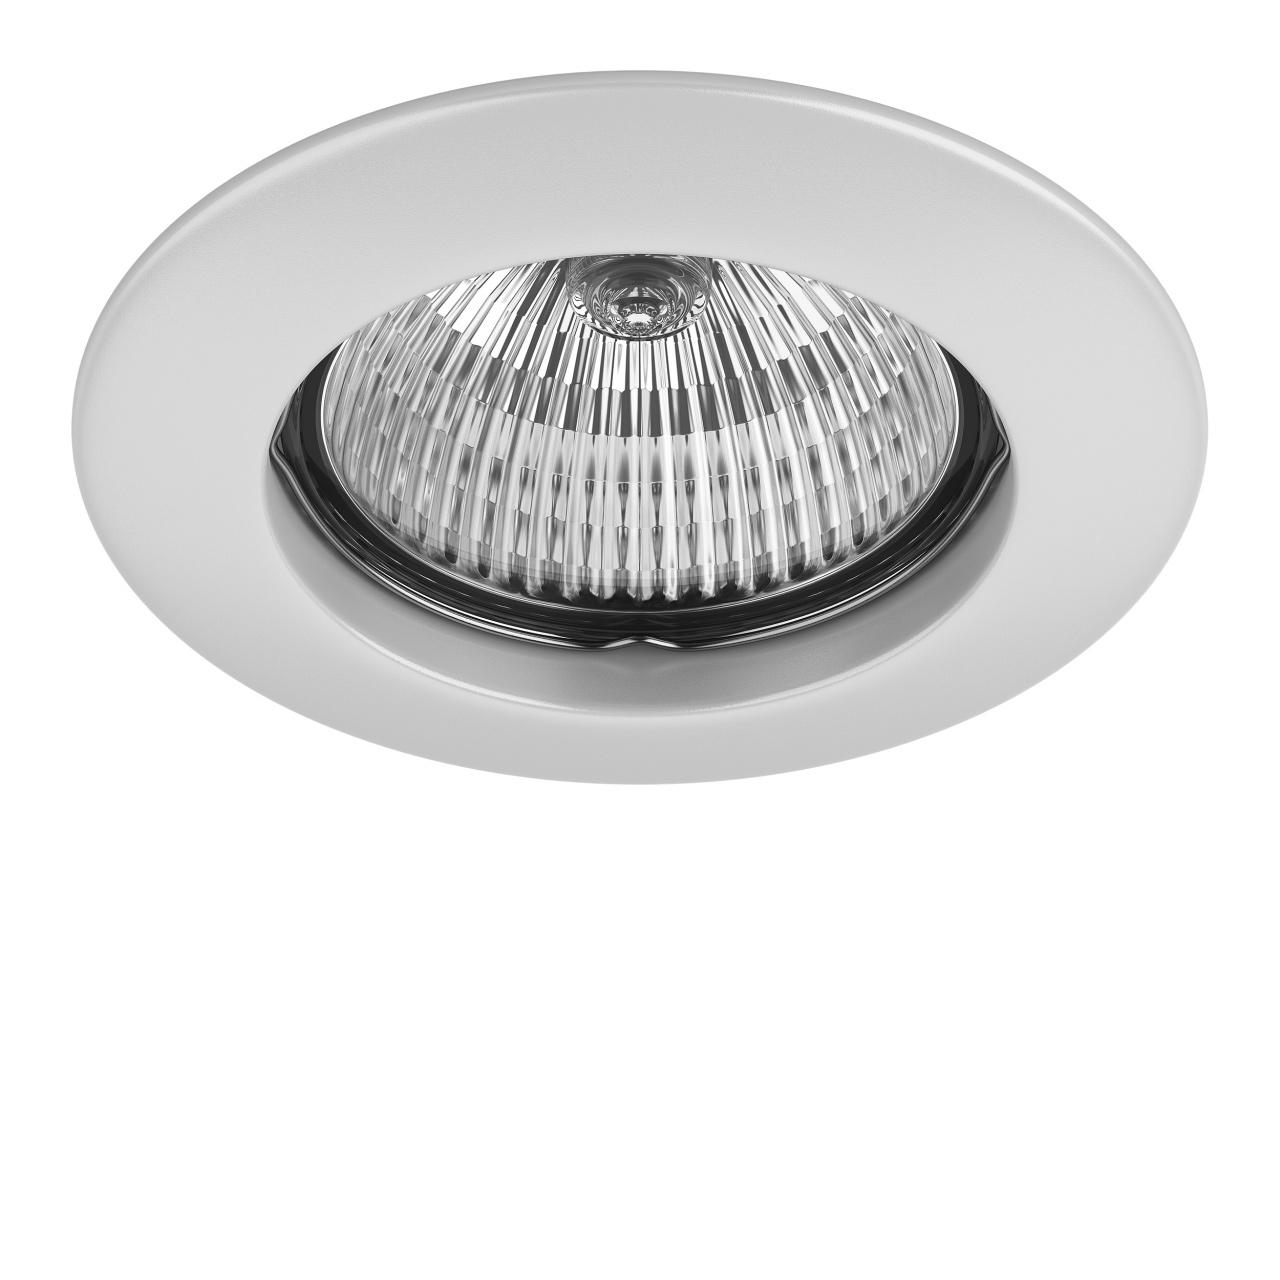 Светильник Teso FIX MR16 / HP16 белый Lightstar 011070